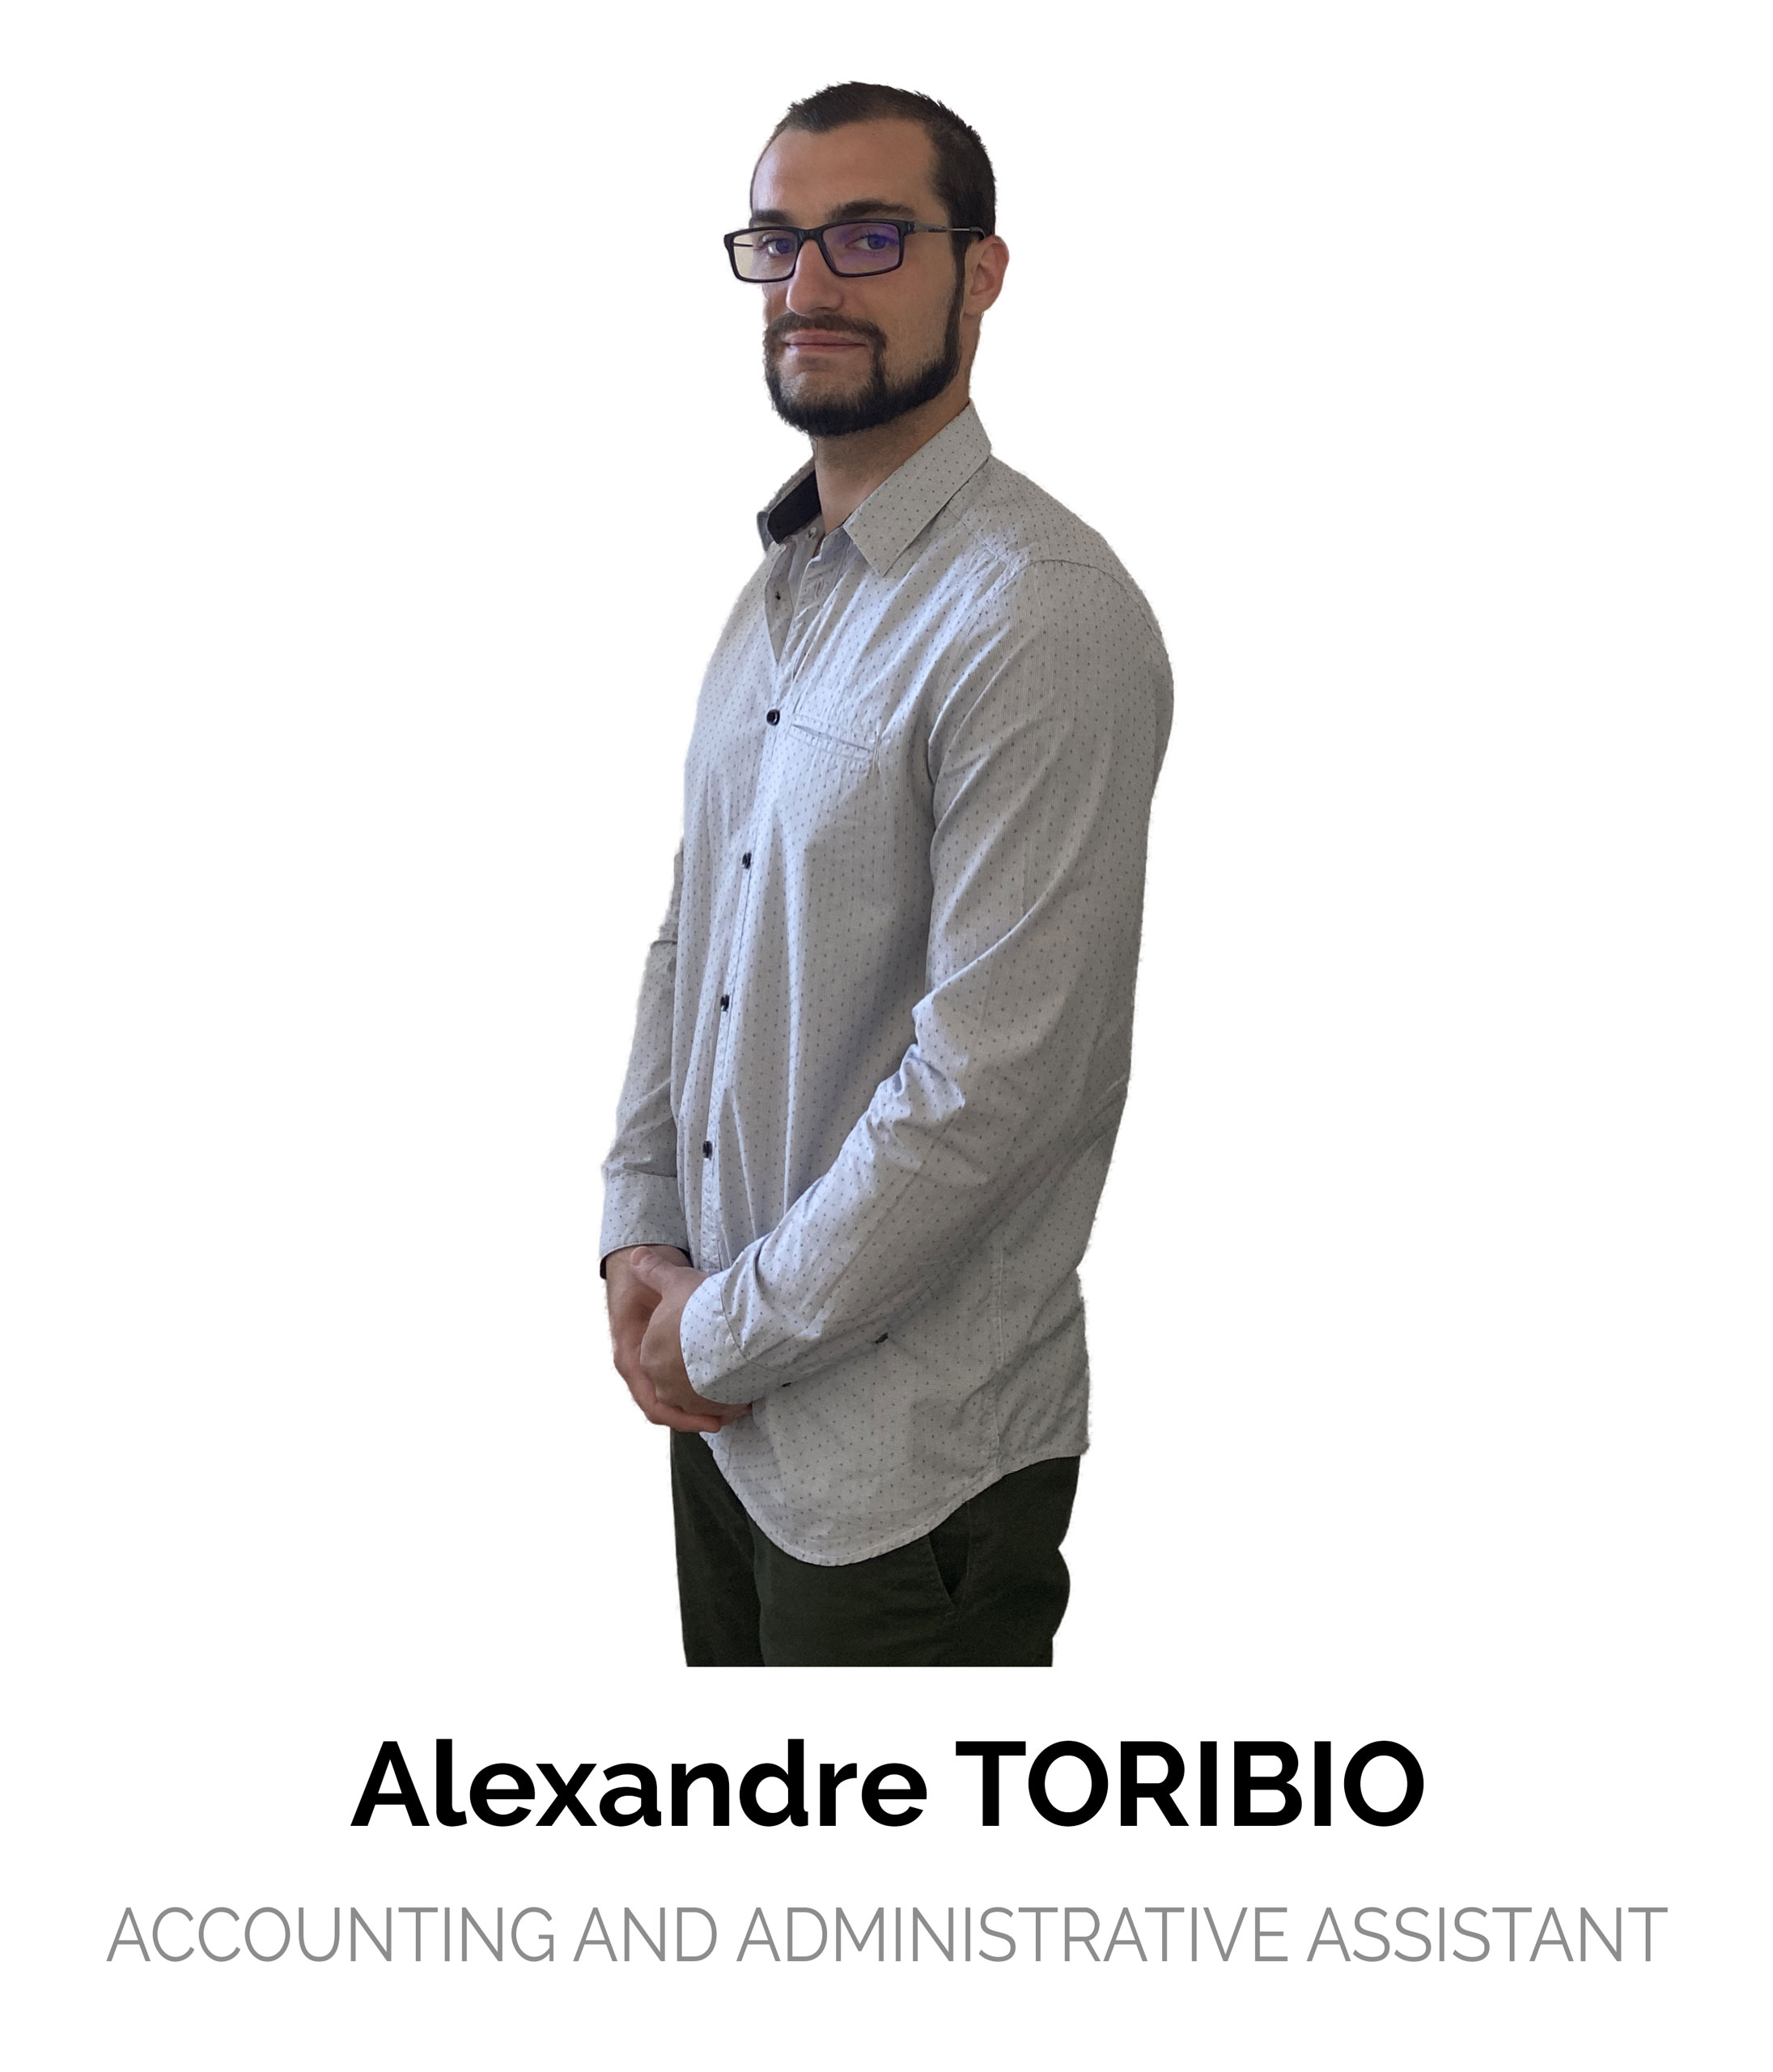 alexandre-toribio